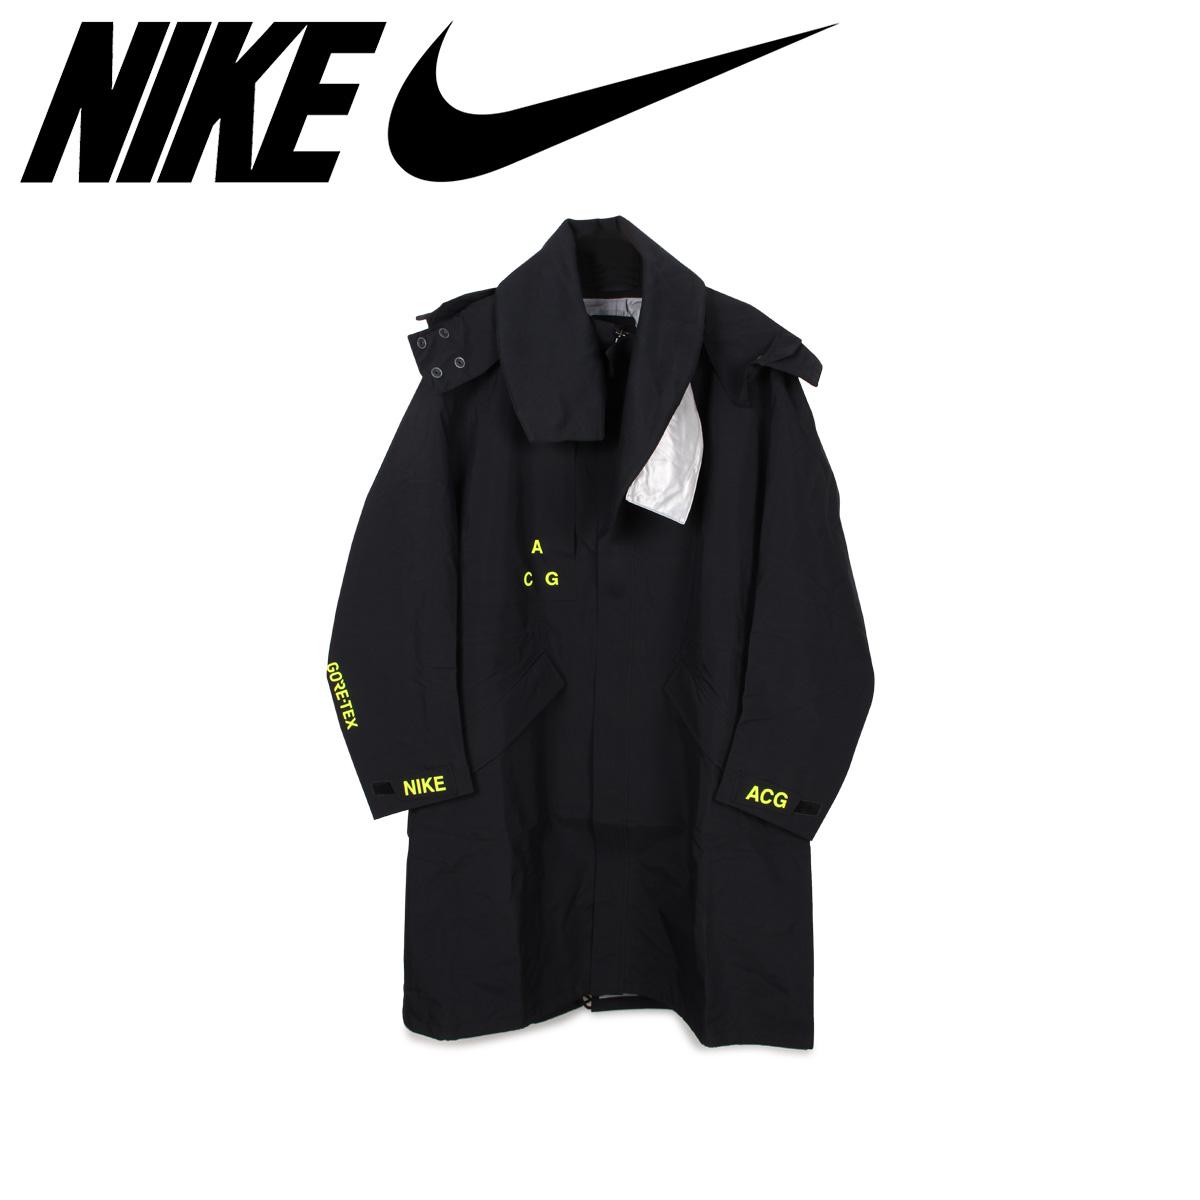 NIKE ACG GORETEX COAT ナイキ ジャケット コート メンズ ゴアテックス 防水 ブラック 黒 AQ3516-010